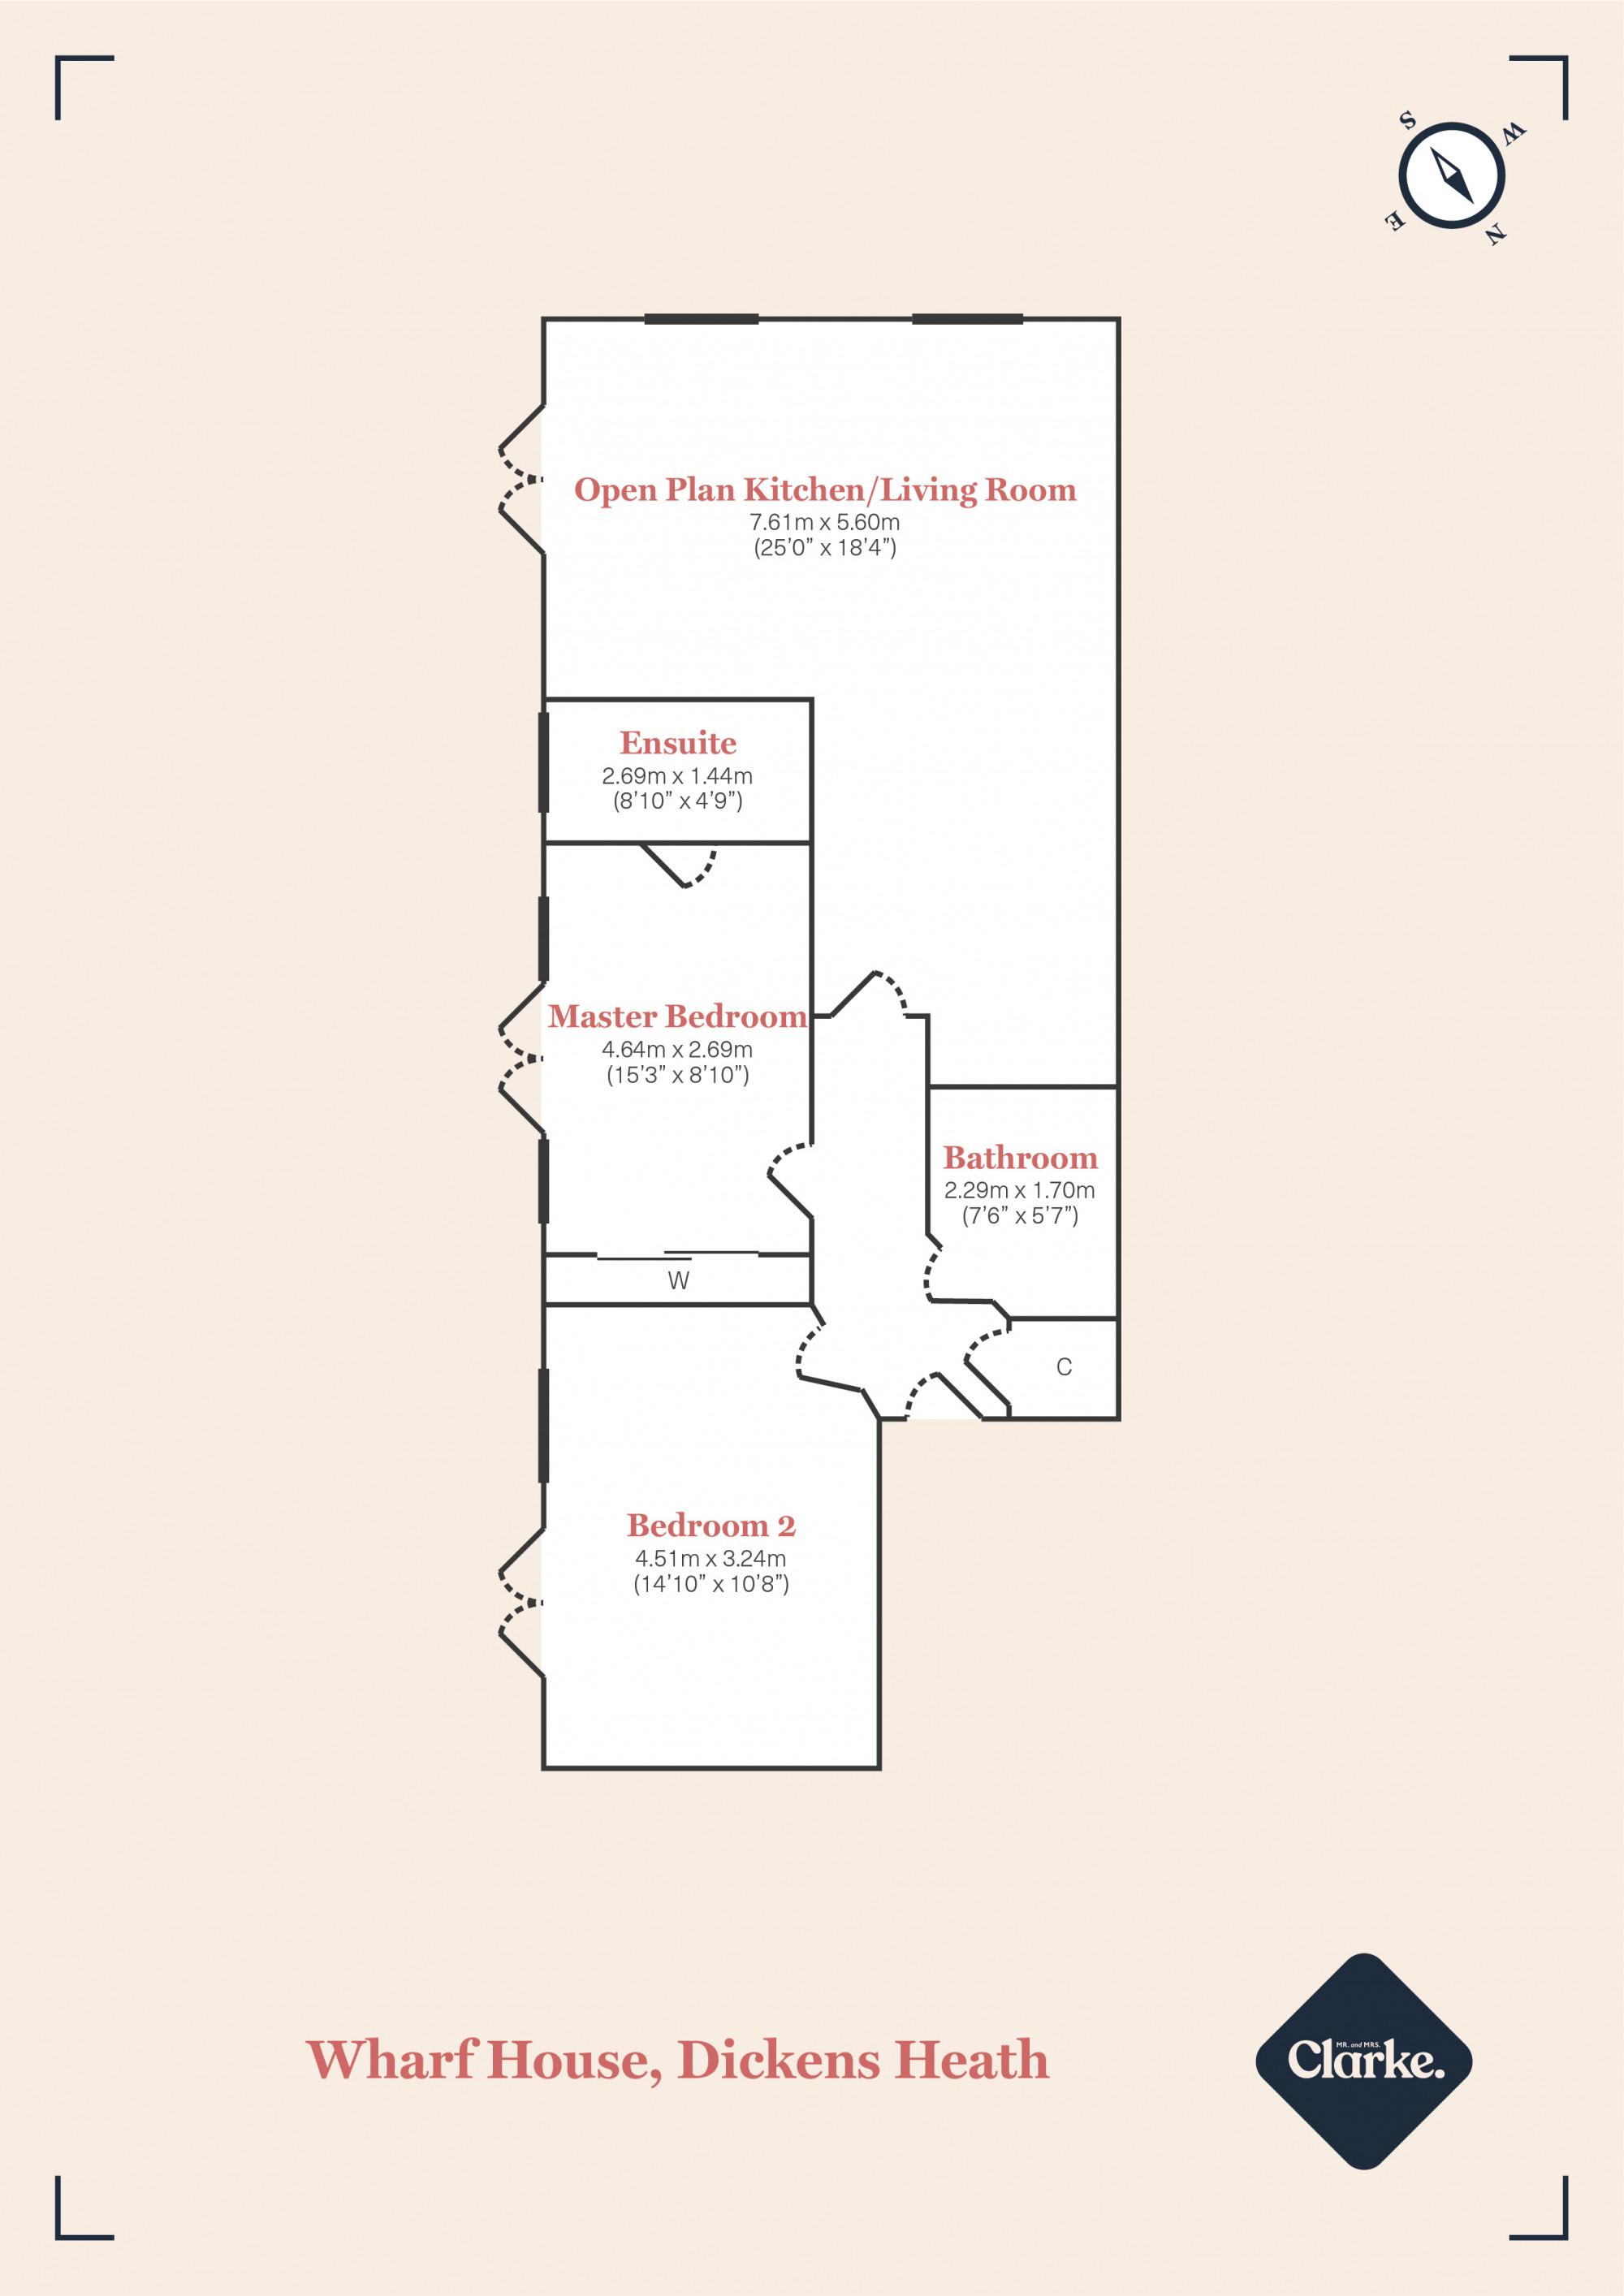 Wharf House, Dickens Heath. Floorplan.